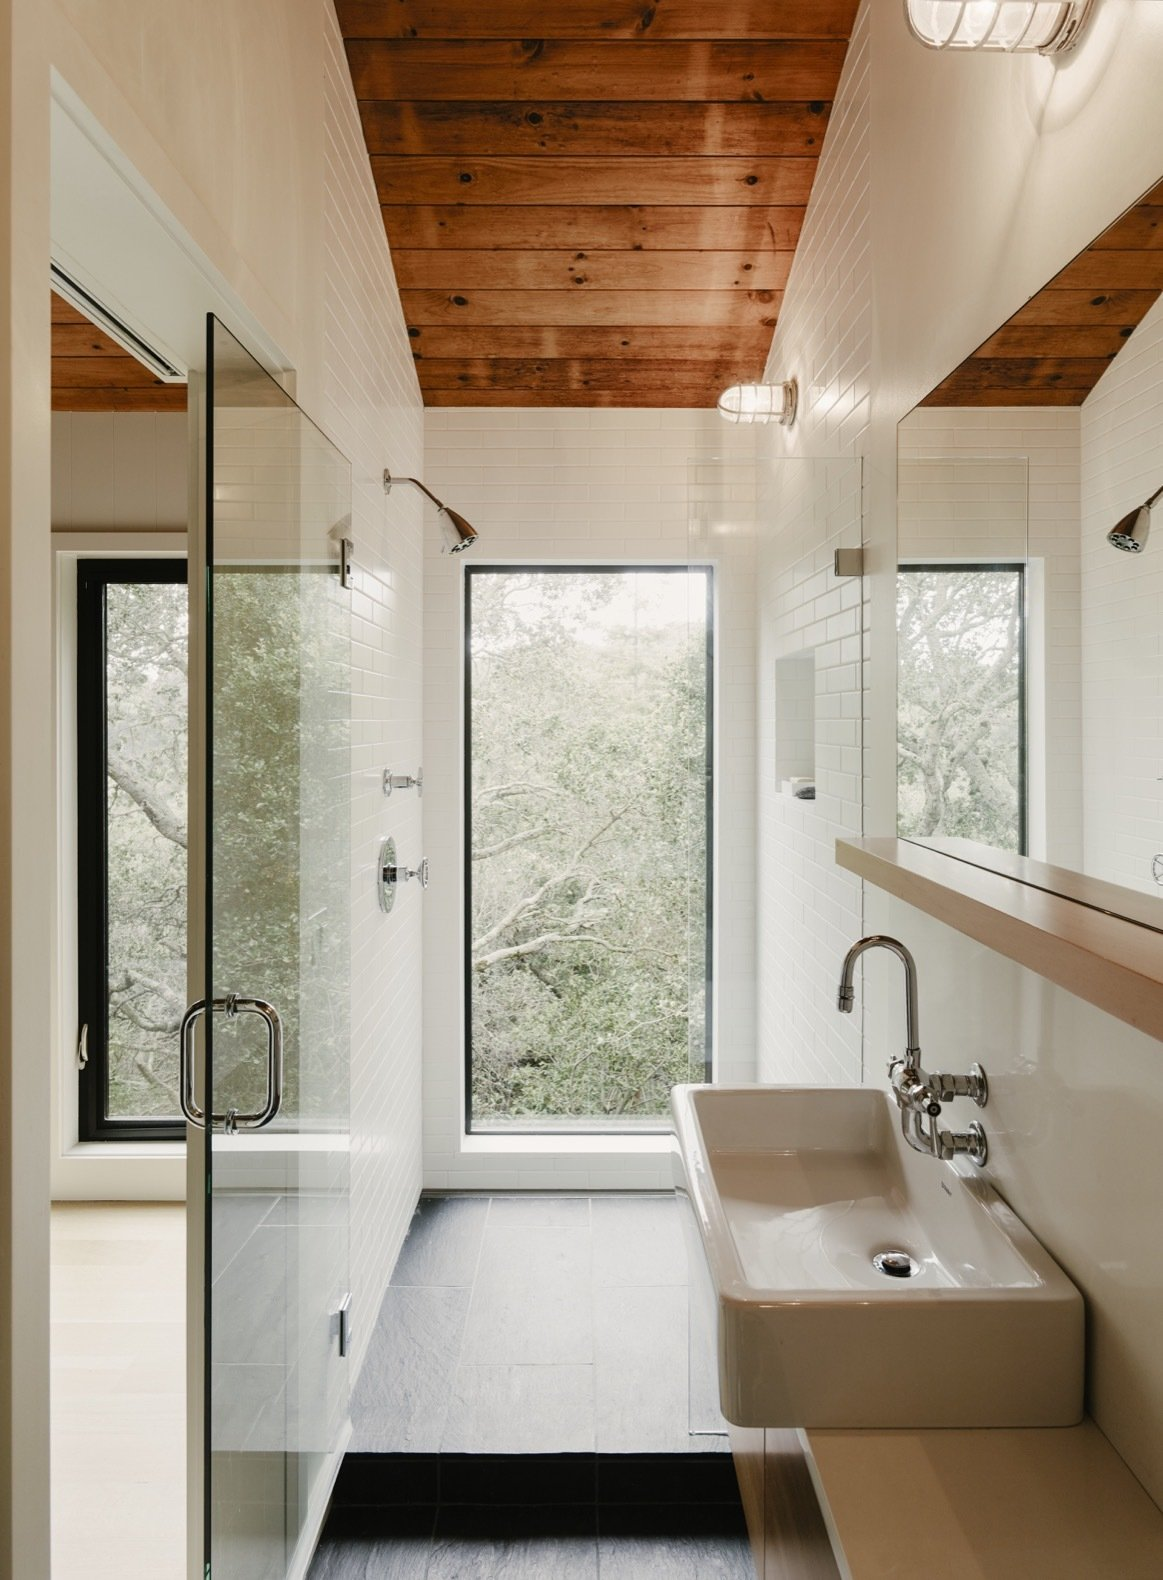 Portola Valley House guest bathroom